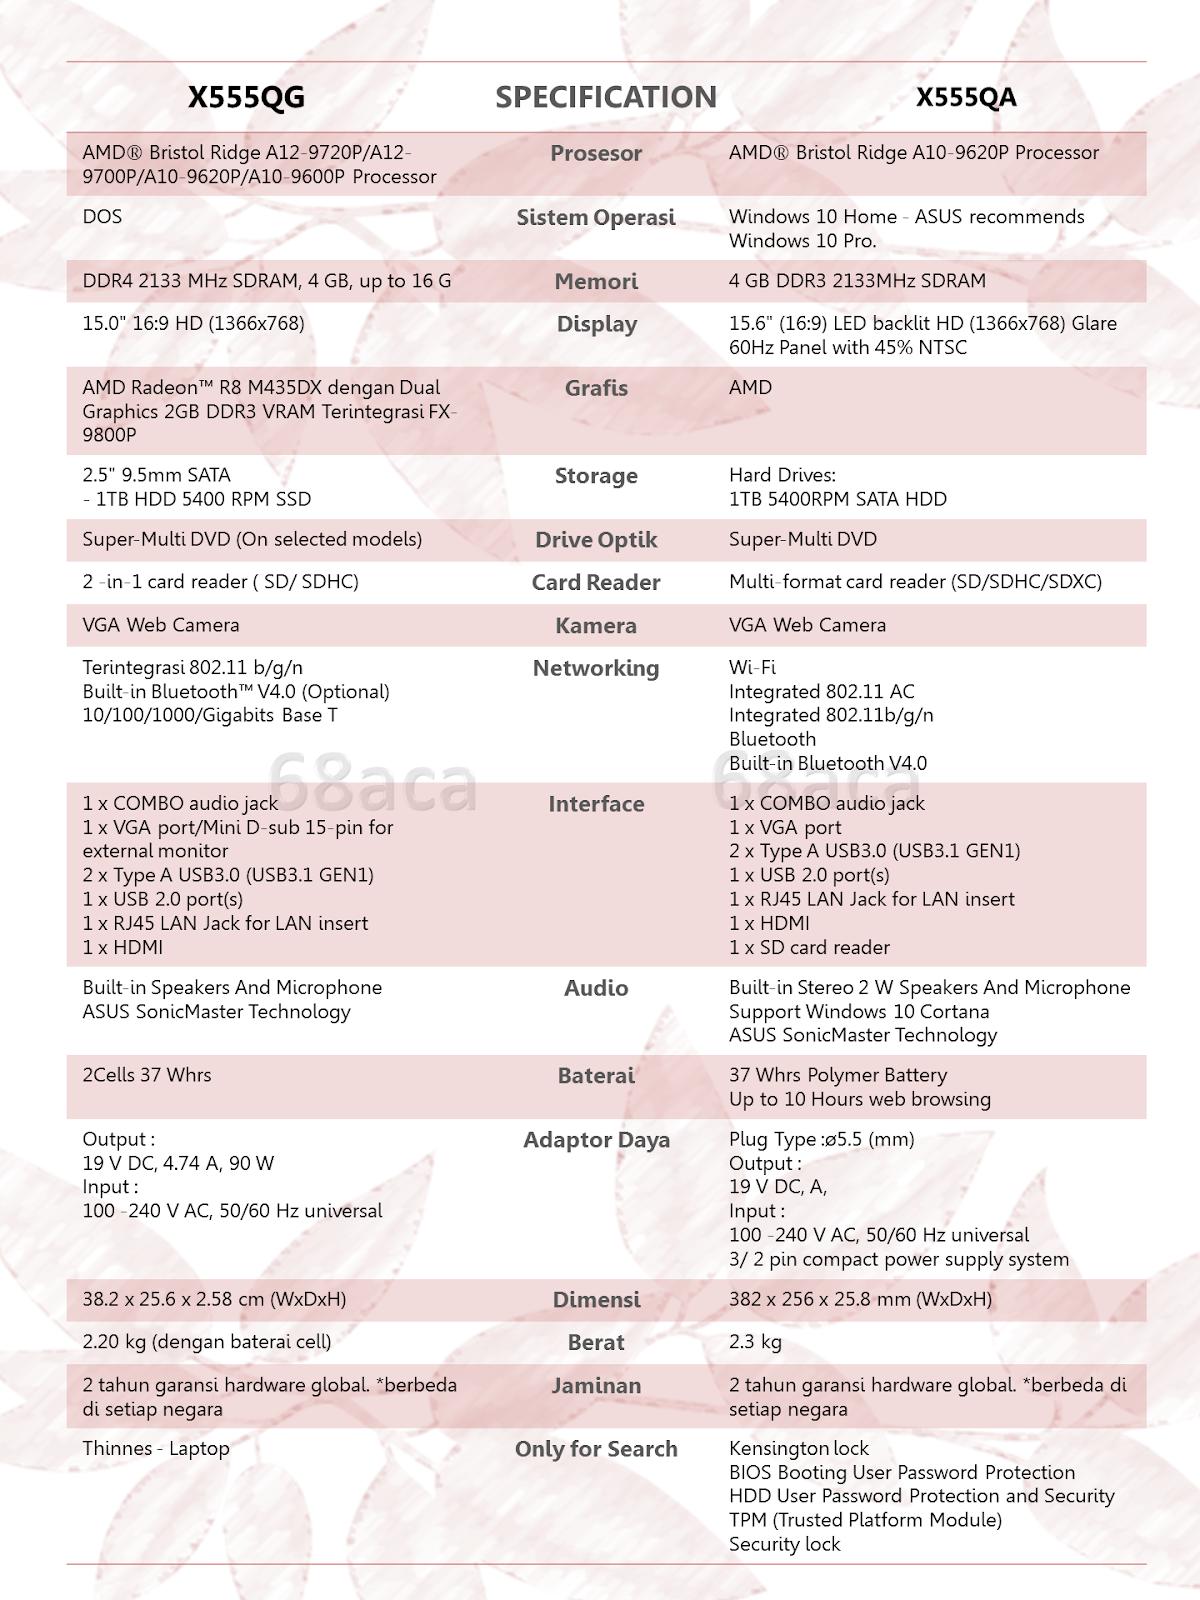 Spesifikasi Notebook ASUS X555QG & X555QA